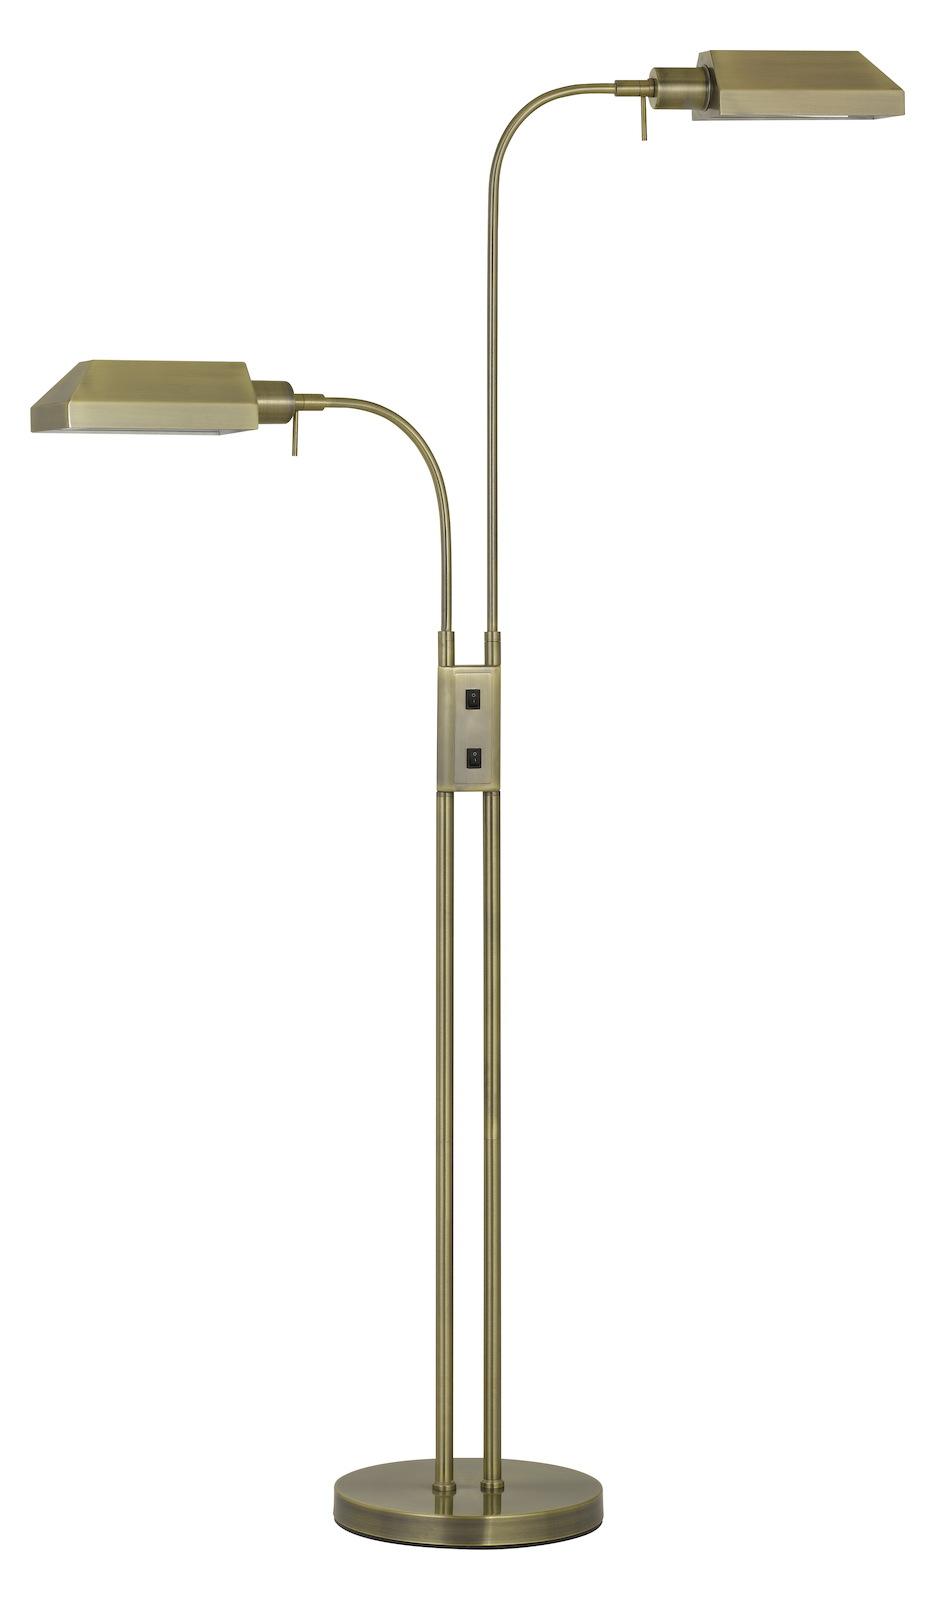 Cal Lighting 60w X 2 Pharmacy Dual Height Floor Lamp With